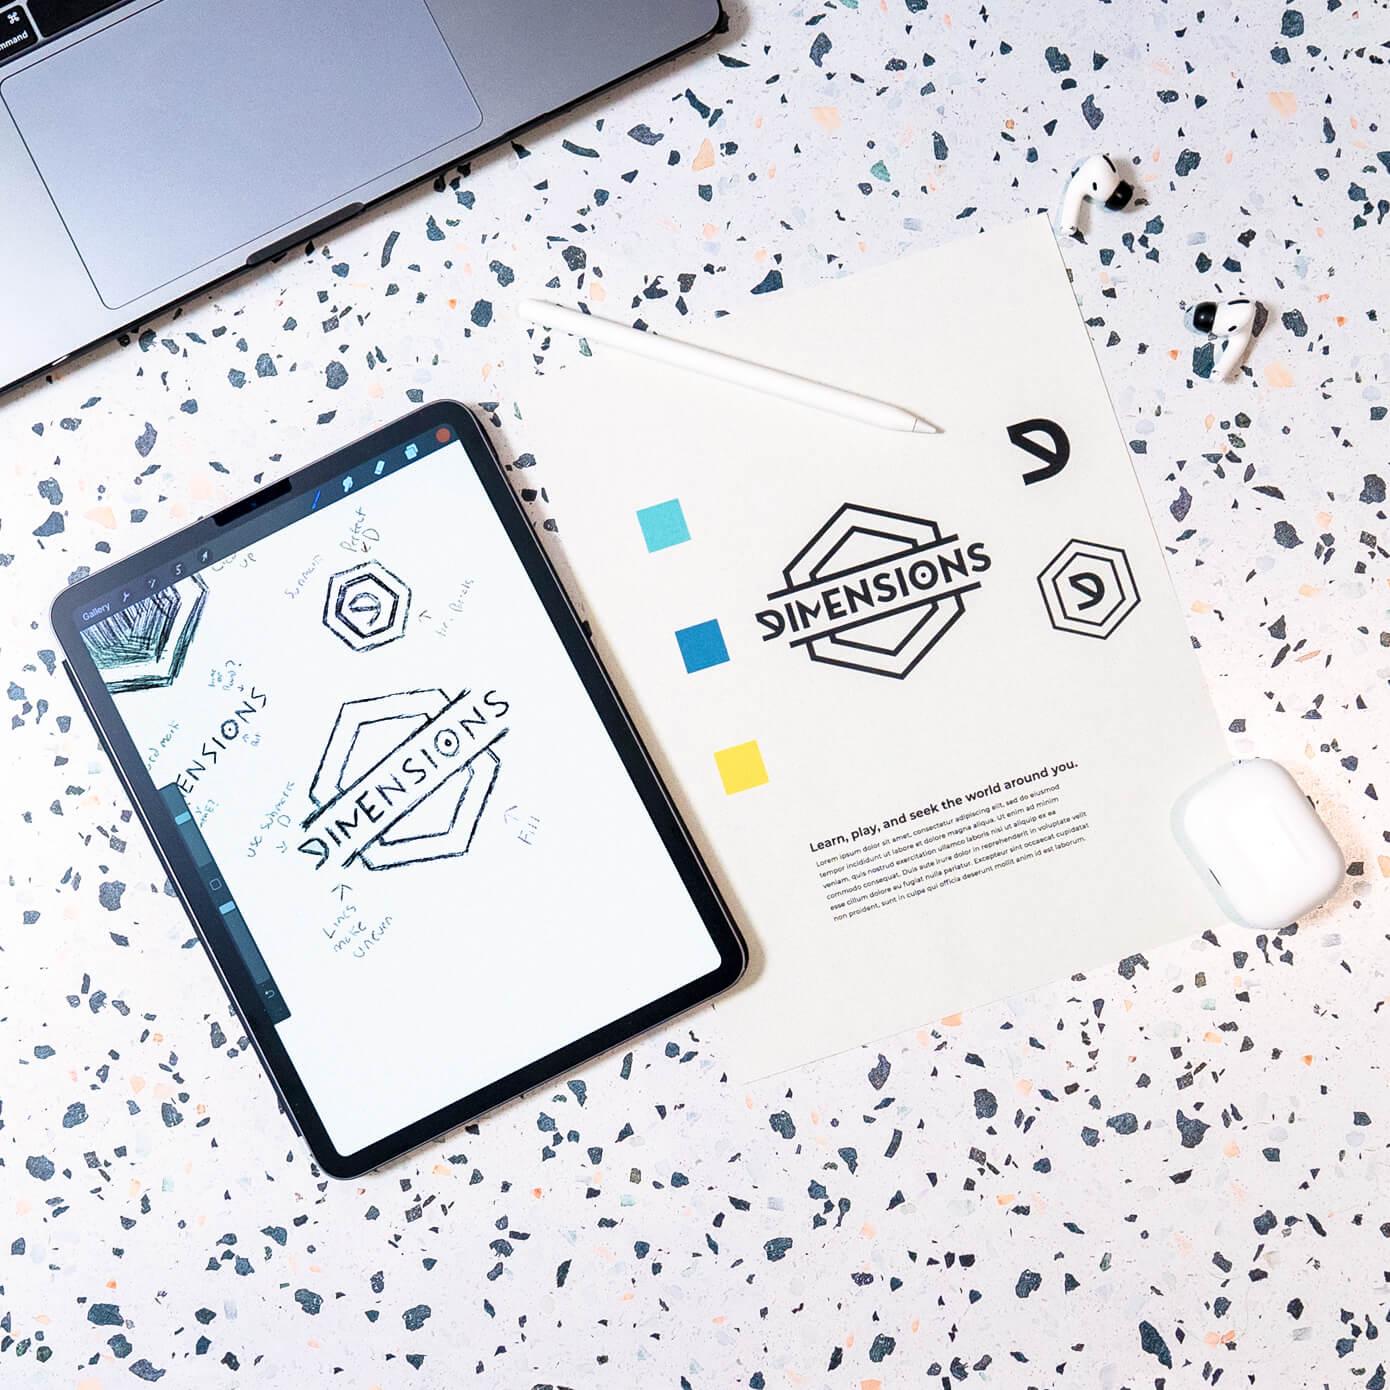 Garett Southeron provides Visual Branding Services as part of Garett®